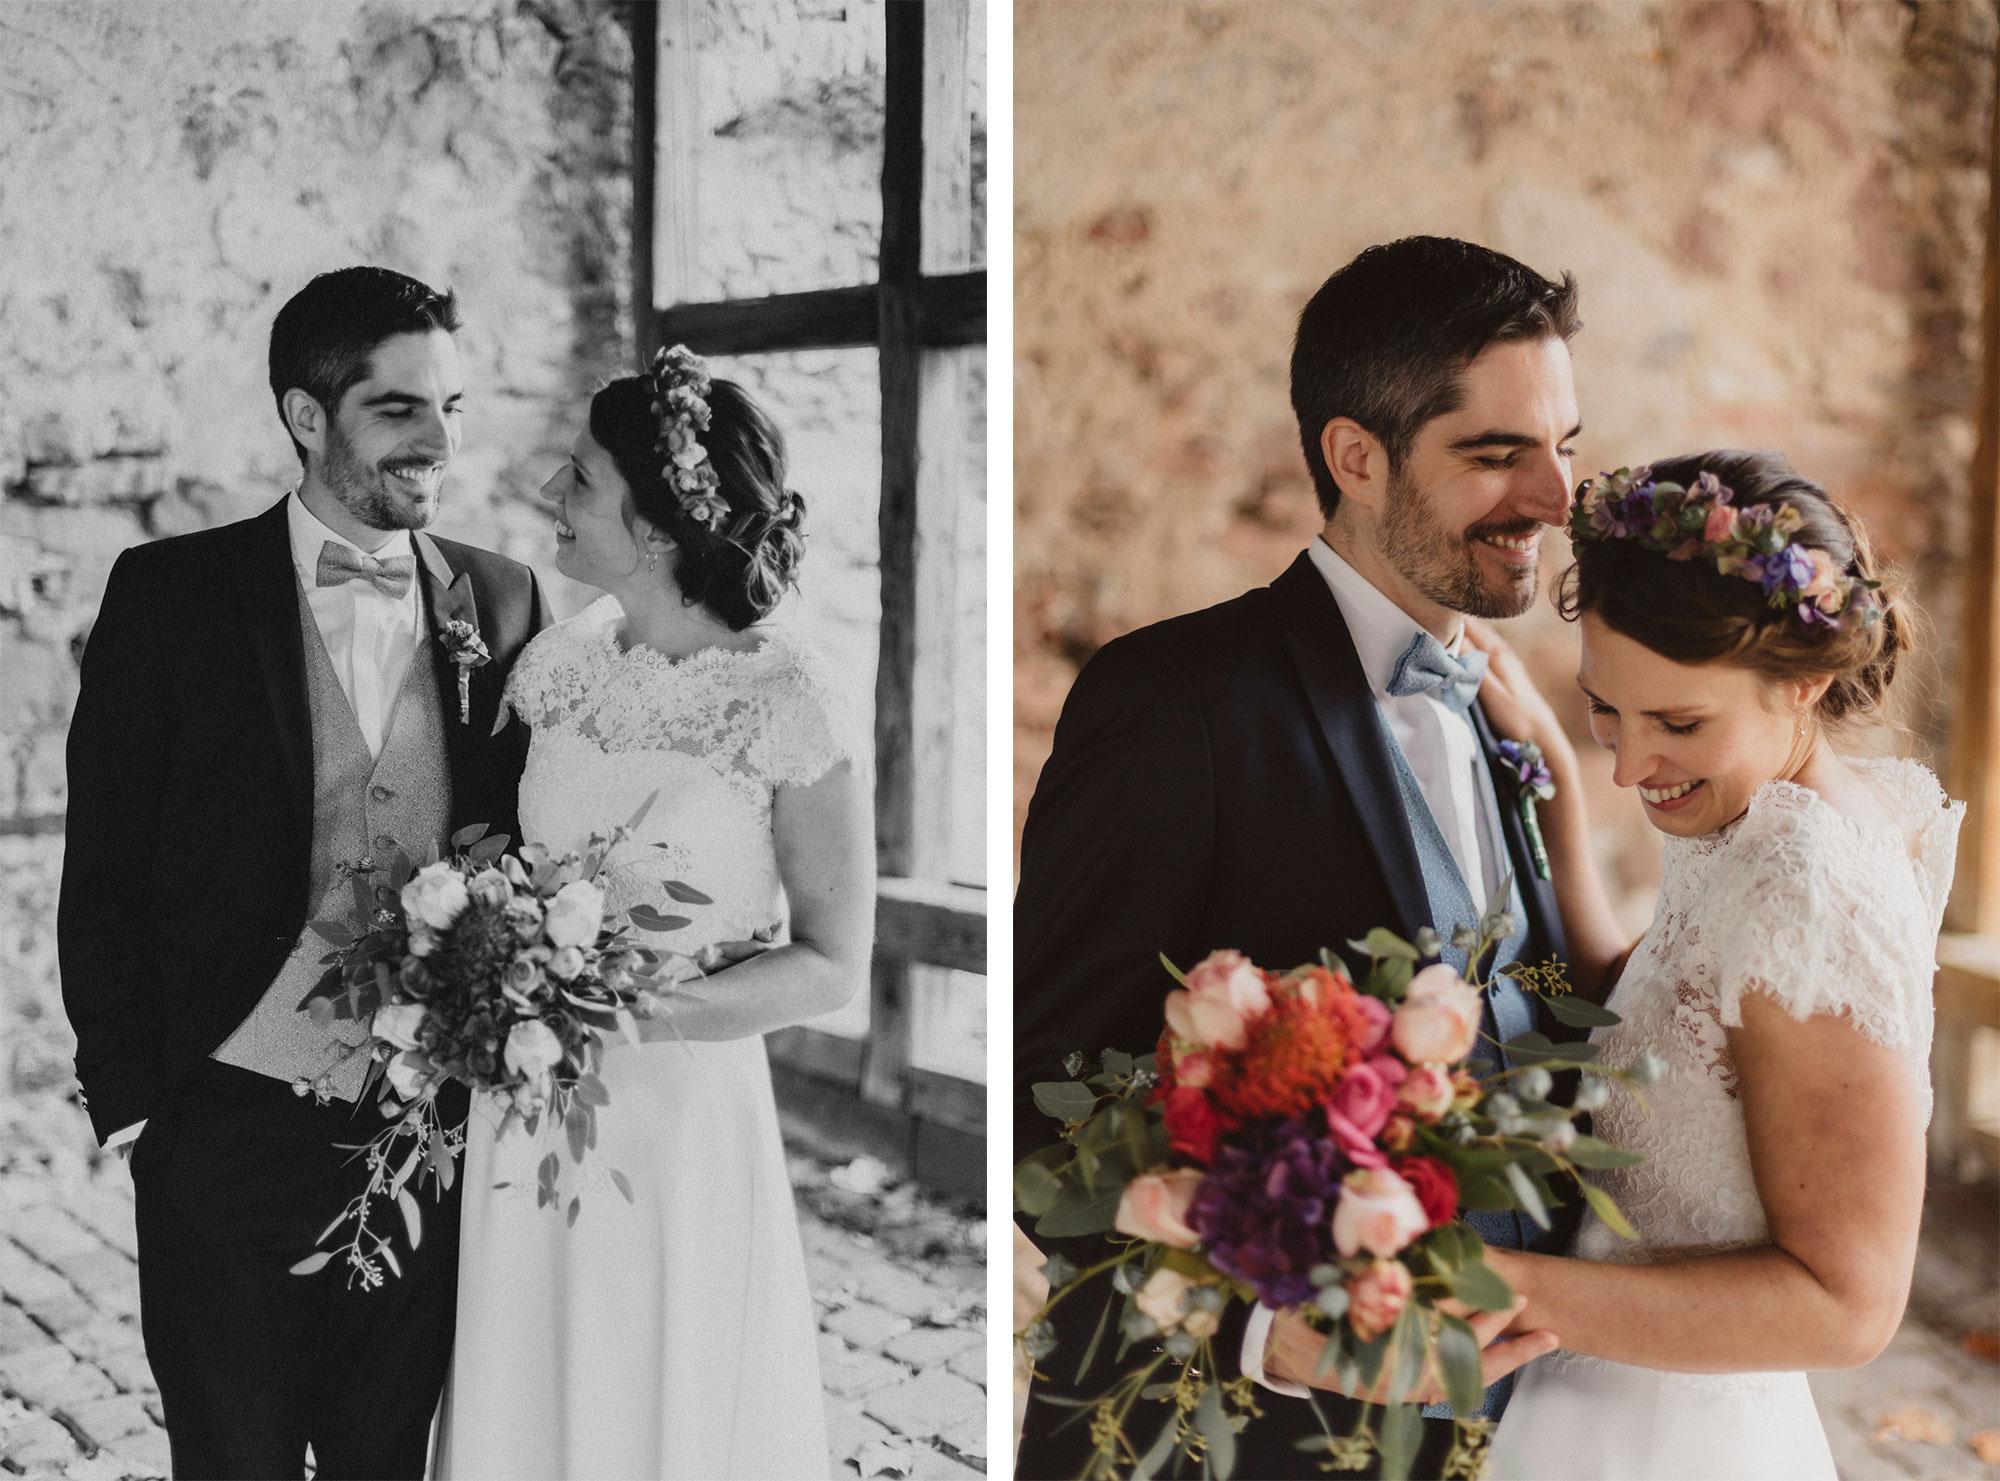 Hochzeitsfotografie-Karlsruhe-Ronja-Flo-12